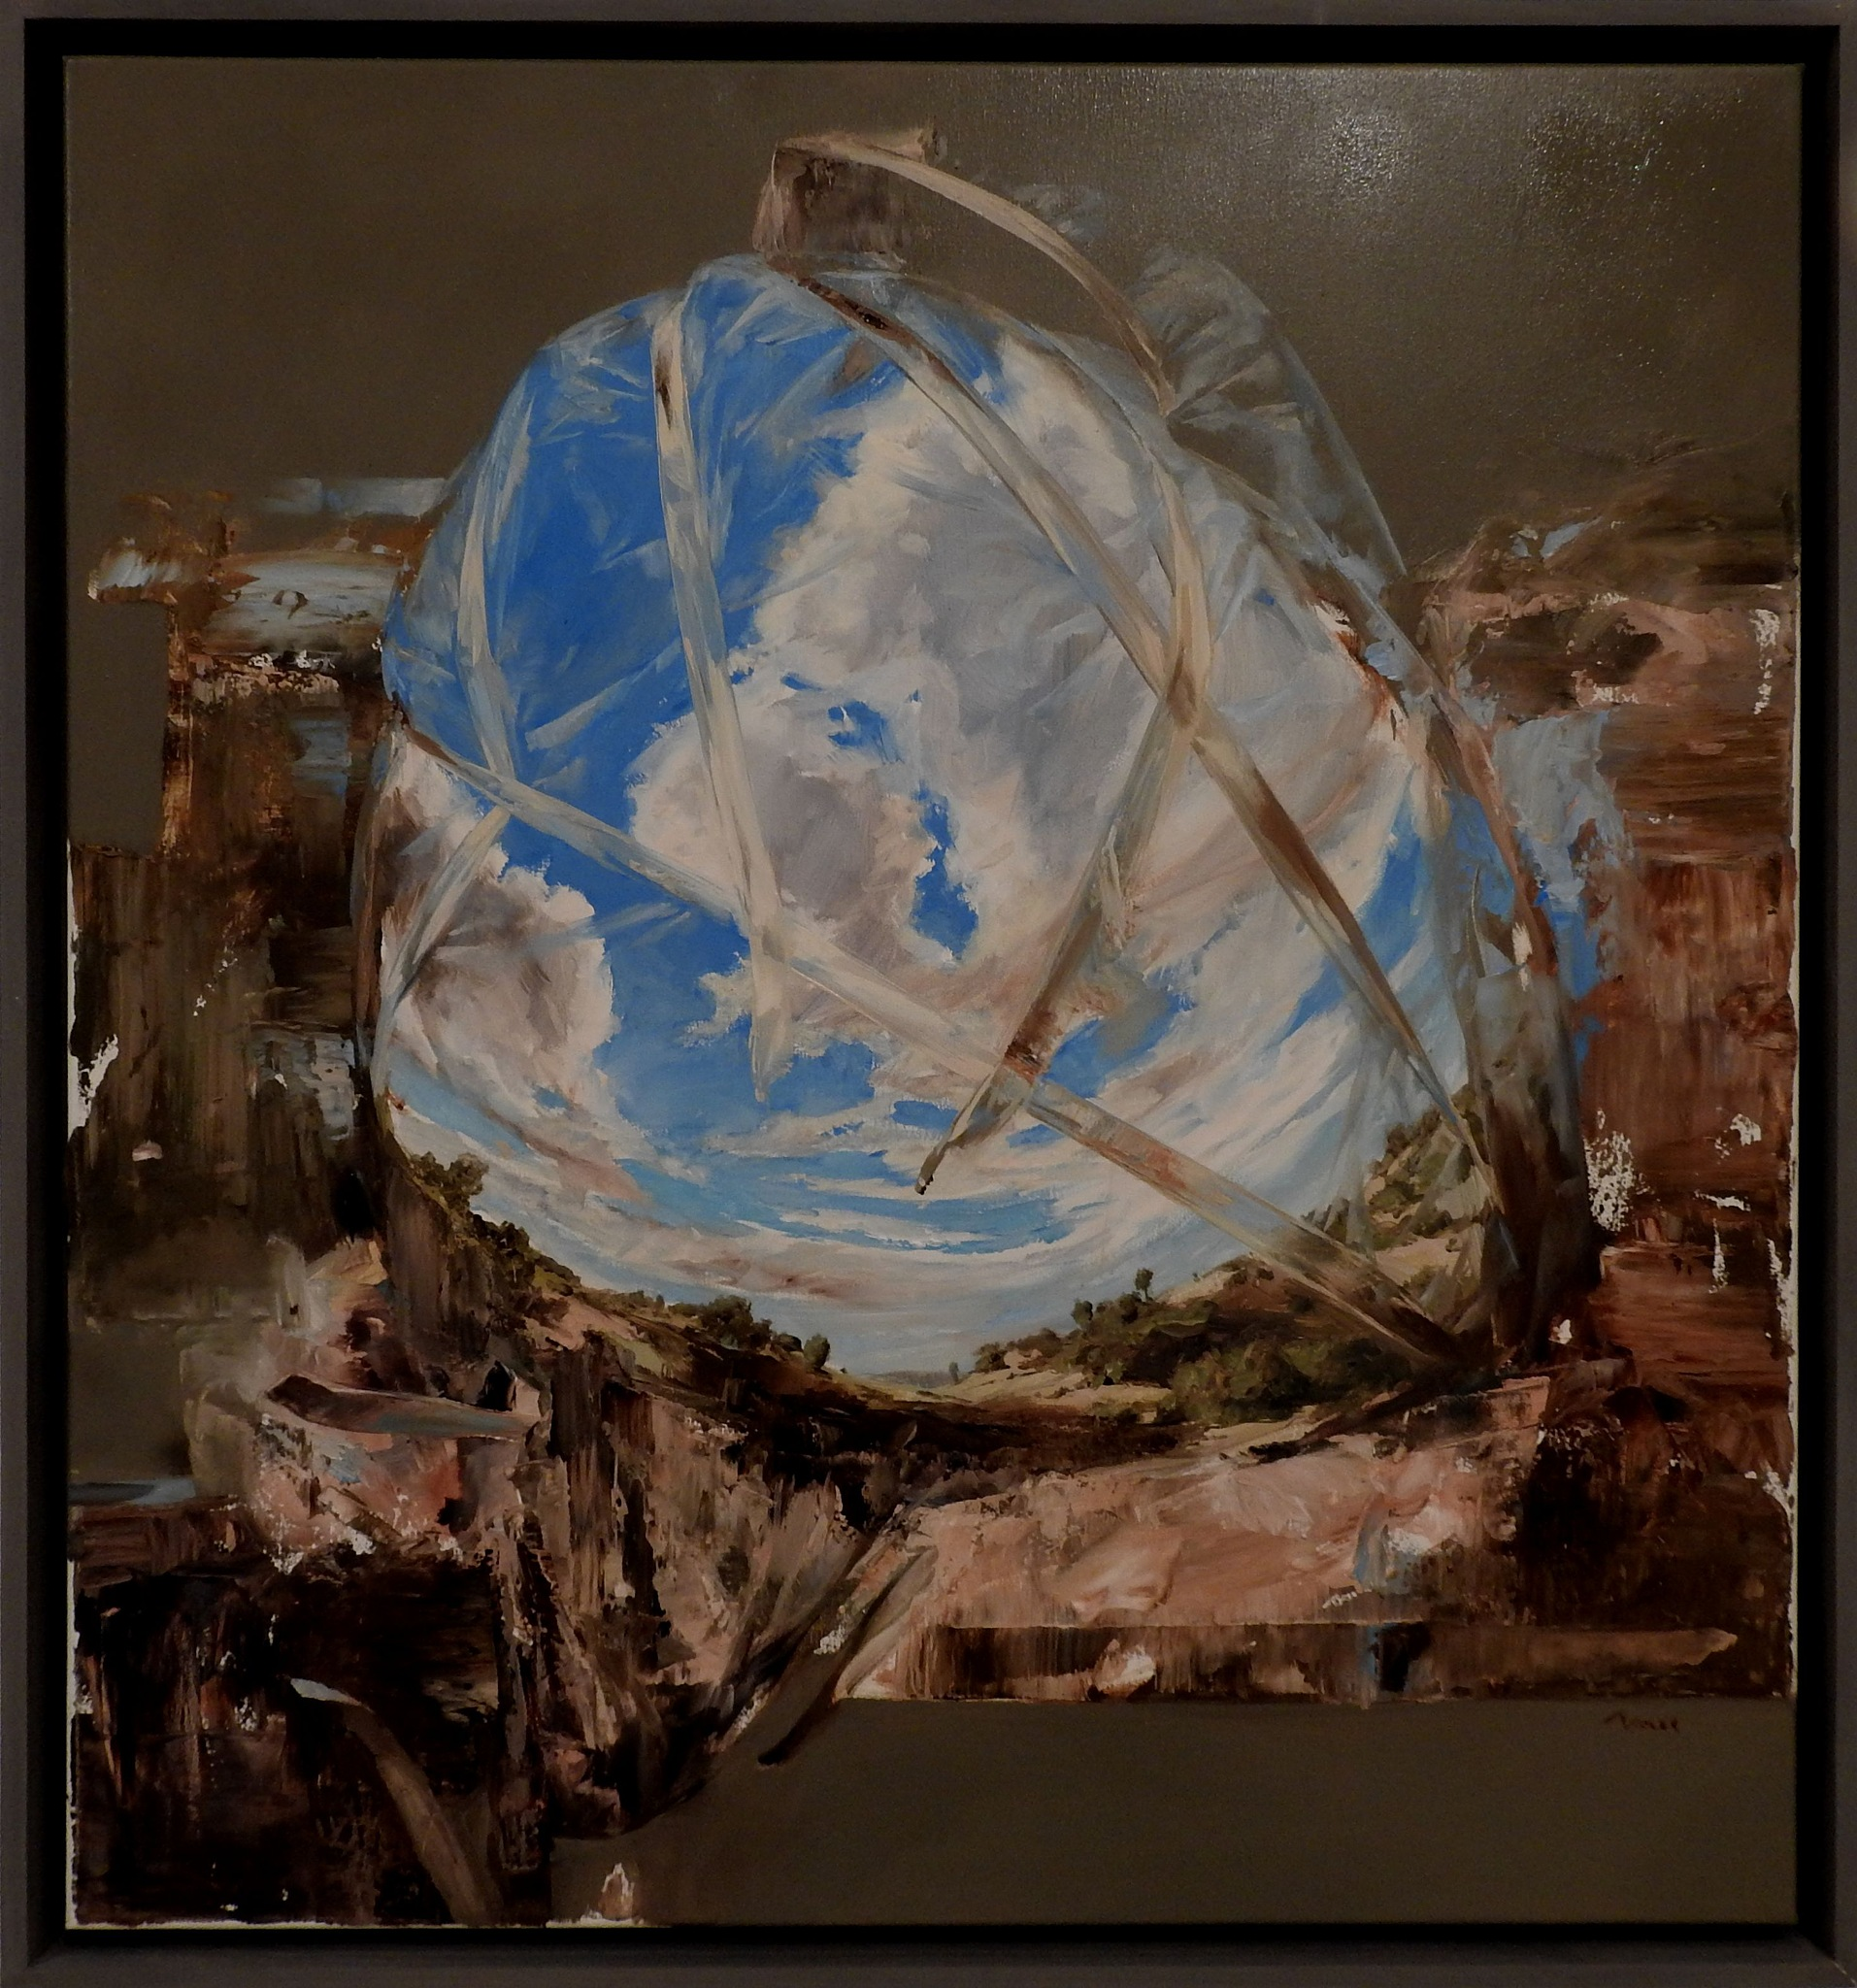 NAPOLI INCONTRA LA RIFORMA - Mózes Incze - Shift Ctrl S - Arte visionaria contemporanea by Delirium Tremends 62